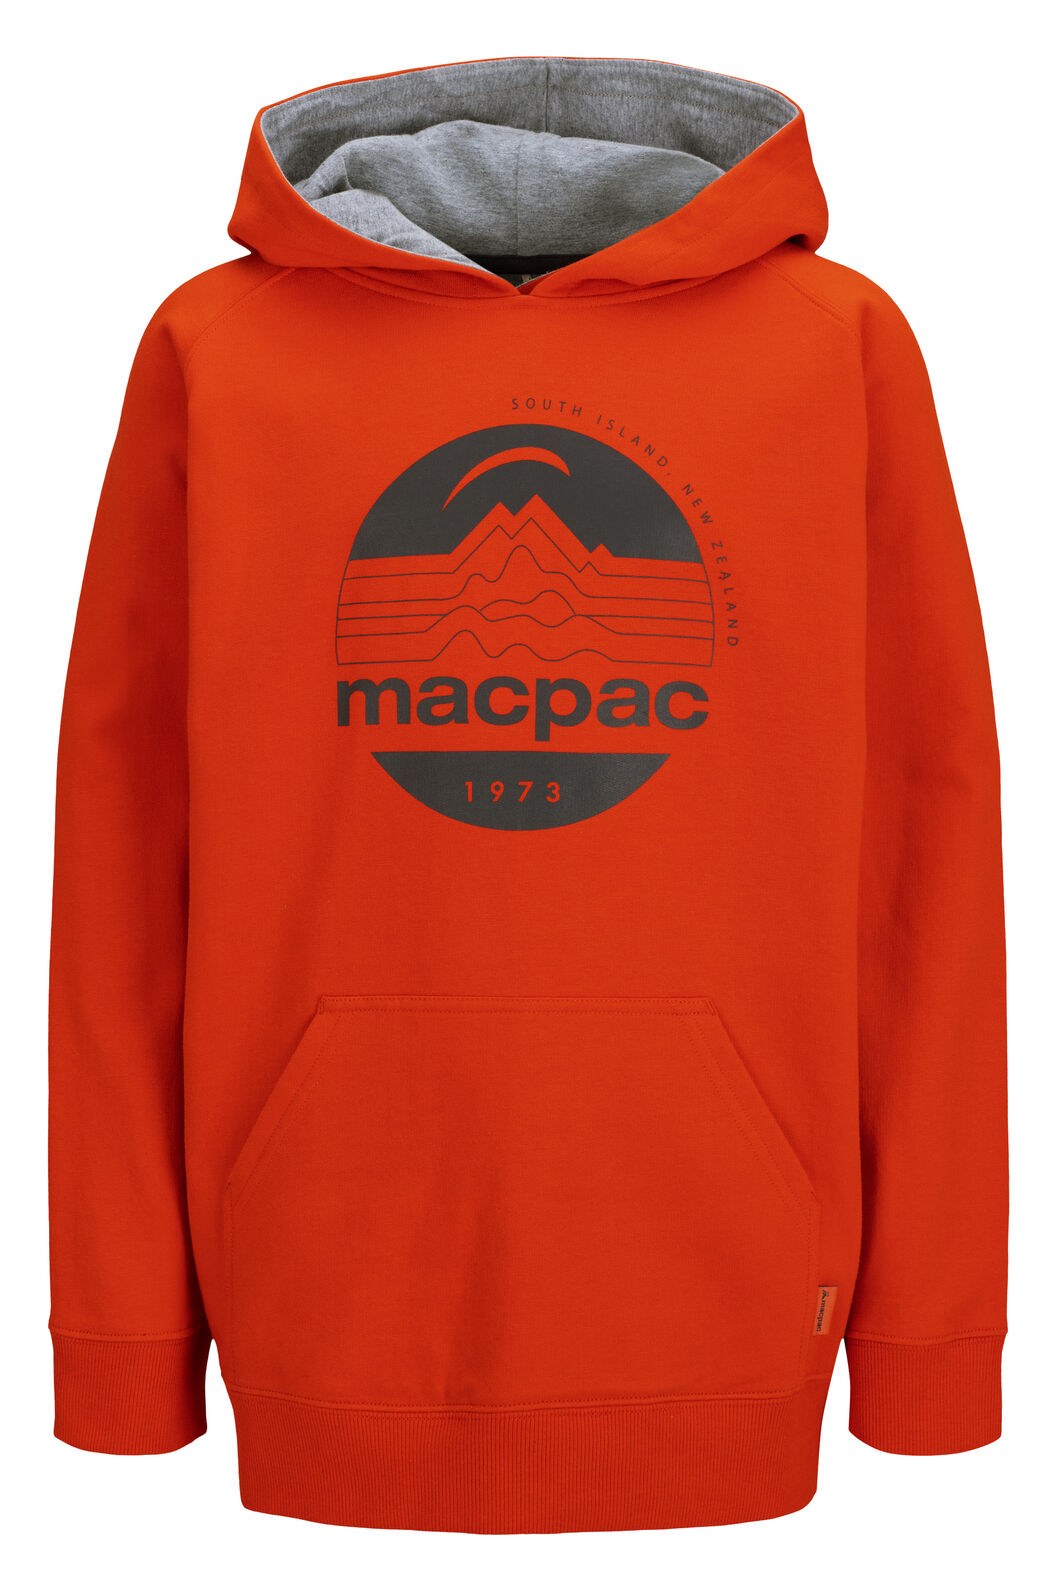 Macpac Fairtrade Organic Cotton Pullover Hoody — Kids' (V2), Pureed Pumpkin, hi-res